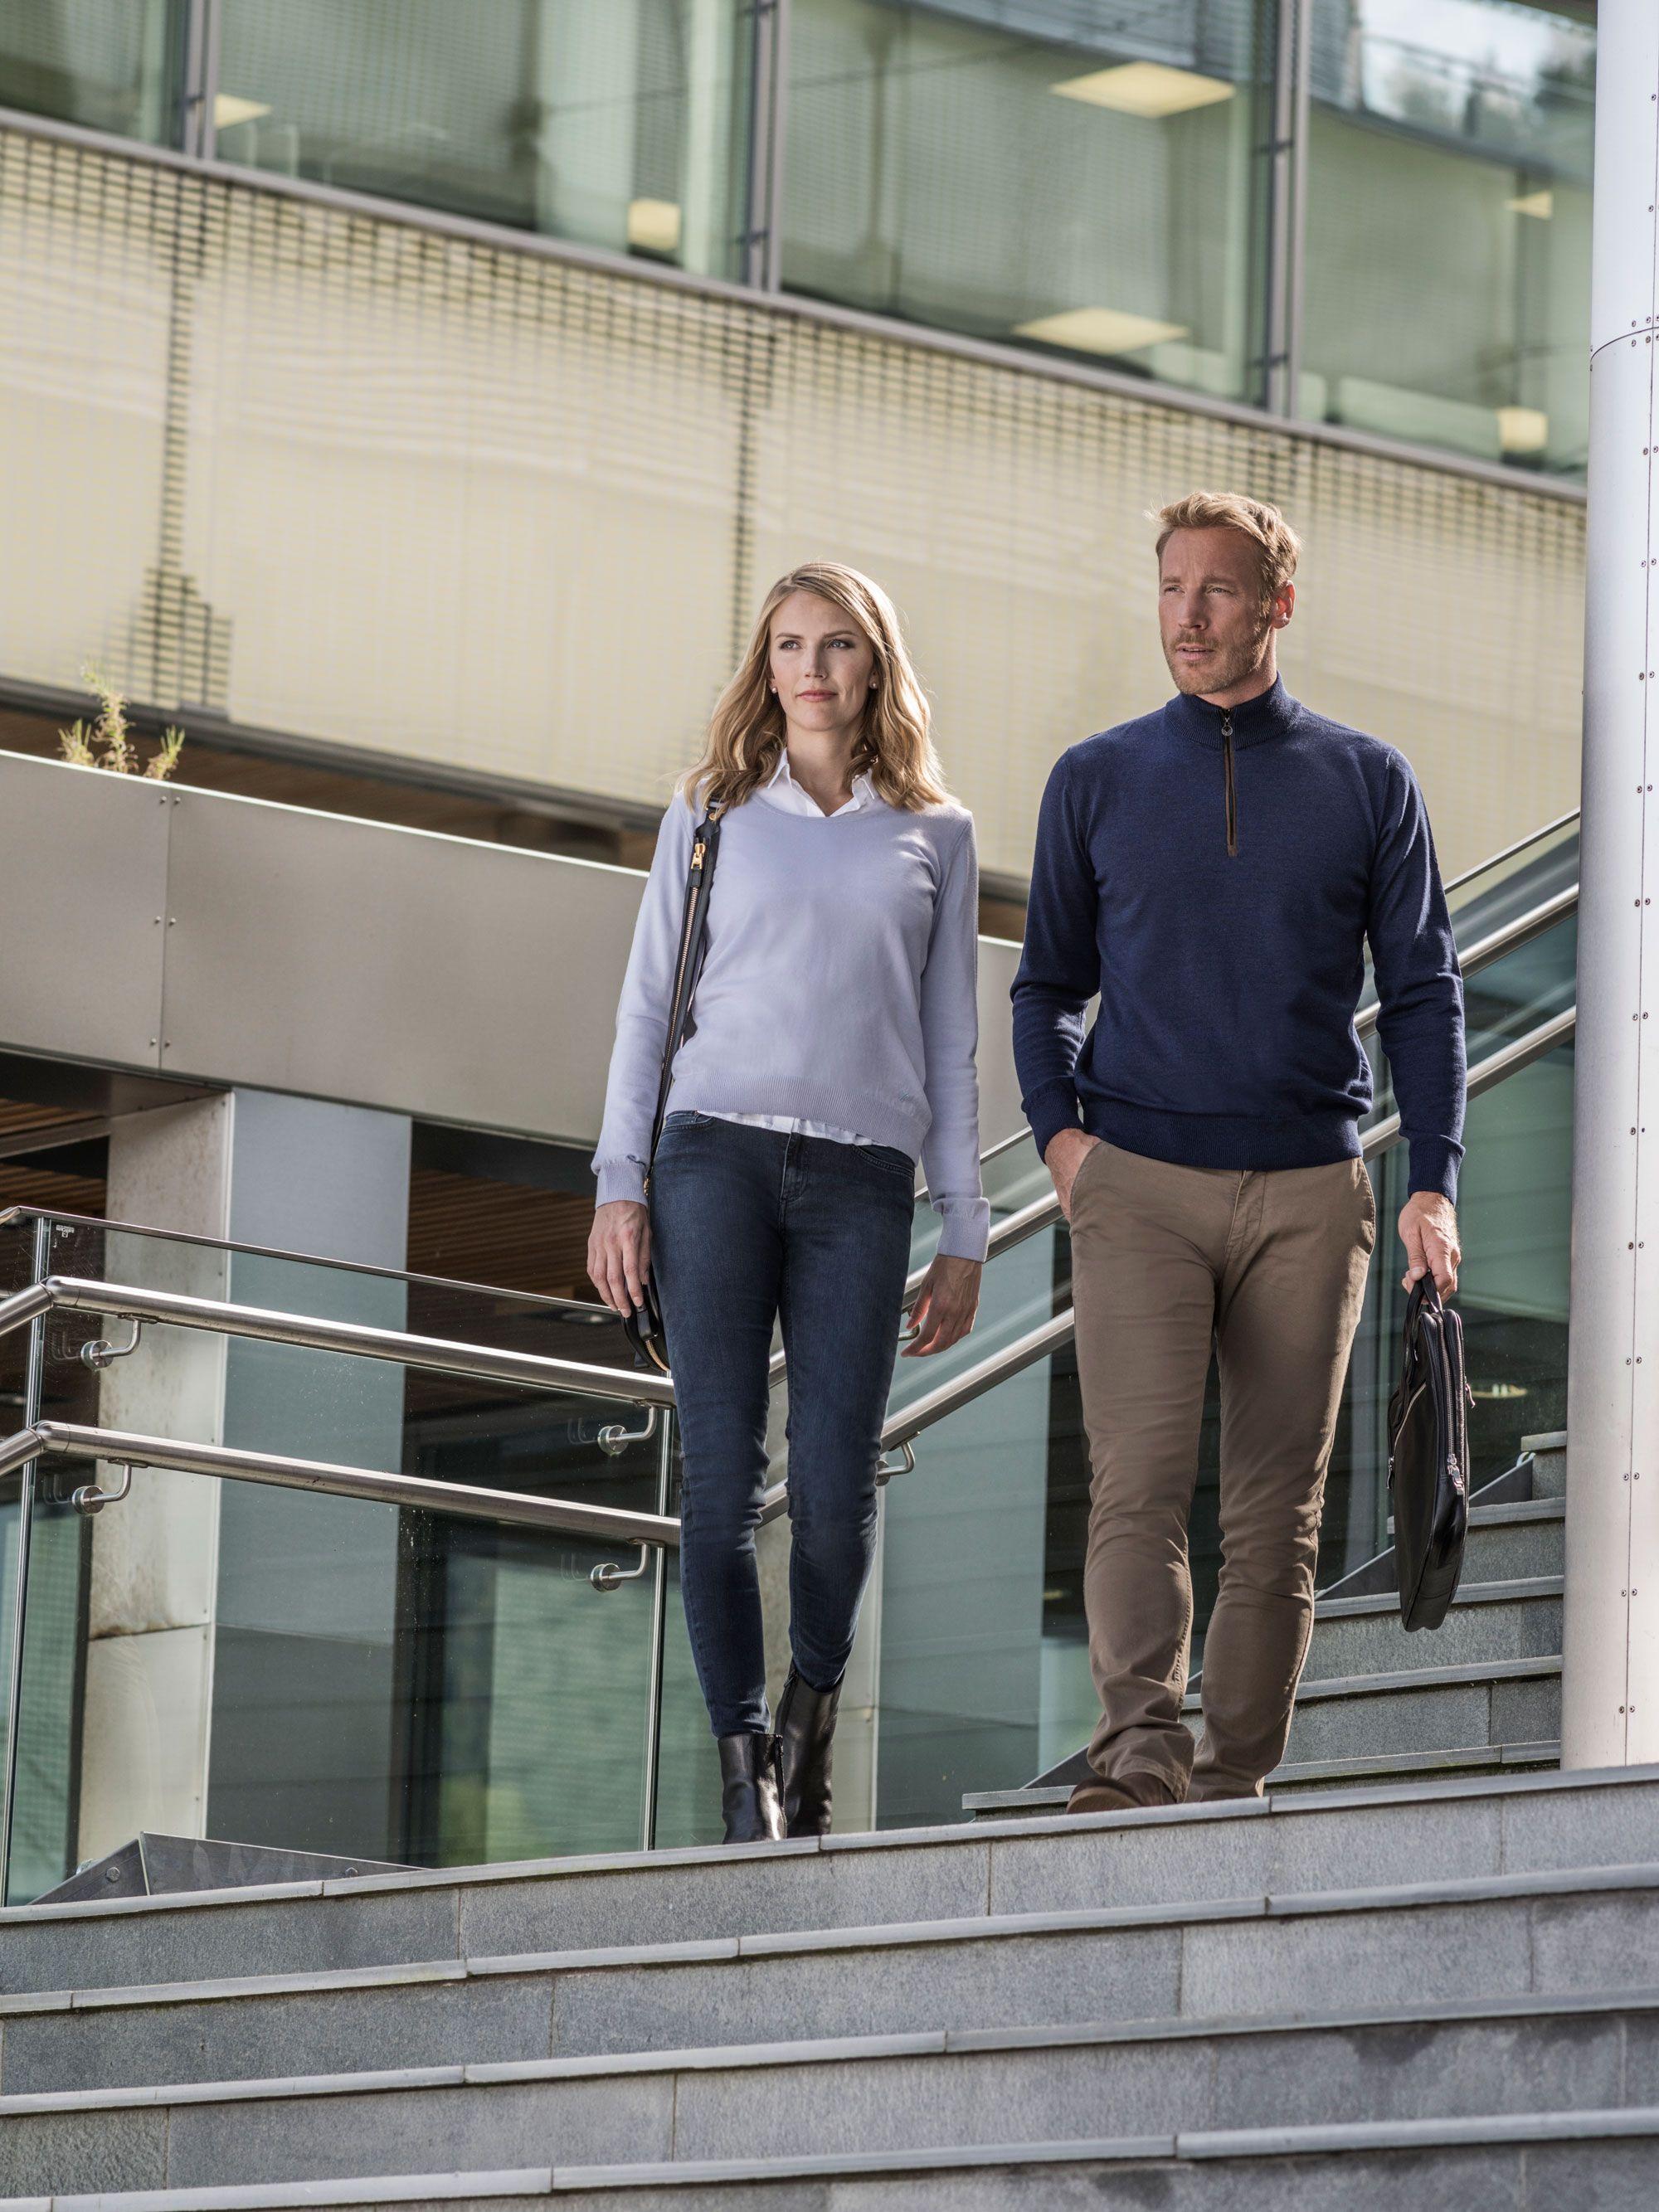 Dale Of Norway Astrid Sweater Olav Sweater Shop Now On Daleofnorway Com Sweater Shop Elegant Jacket Men Sweater